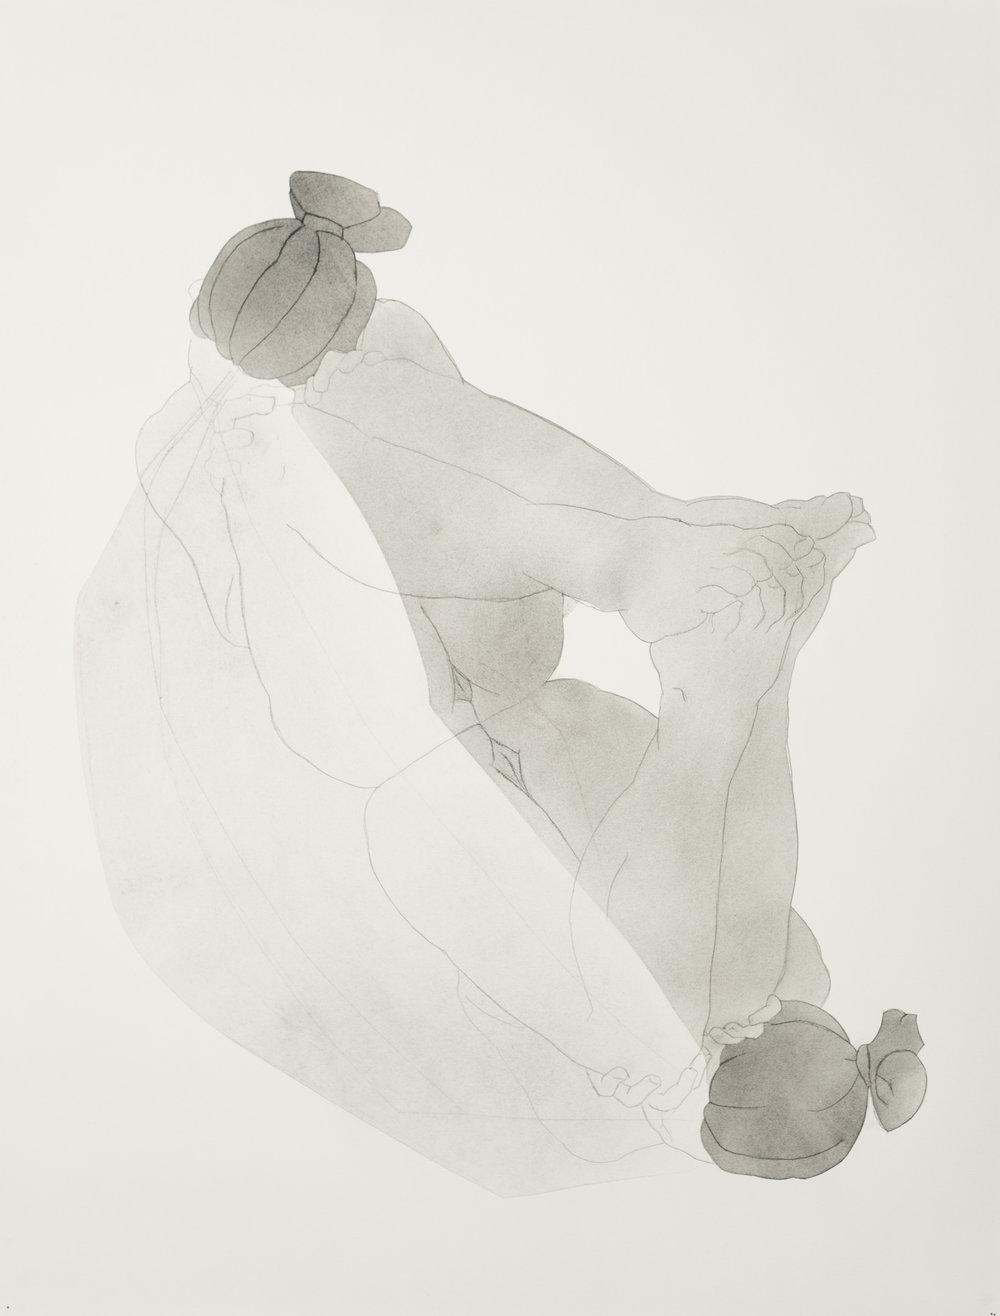 Untitled, 2013. (2013.01.040)